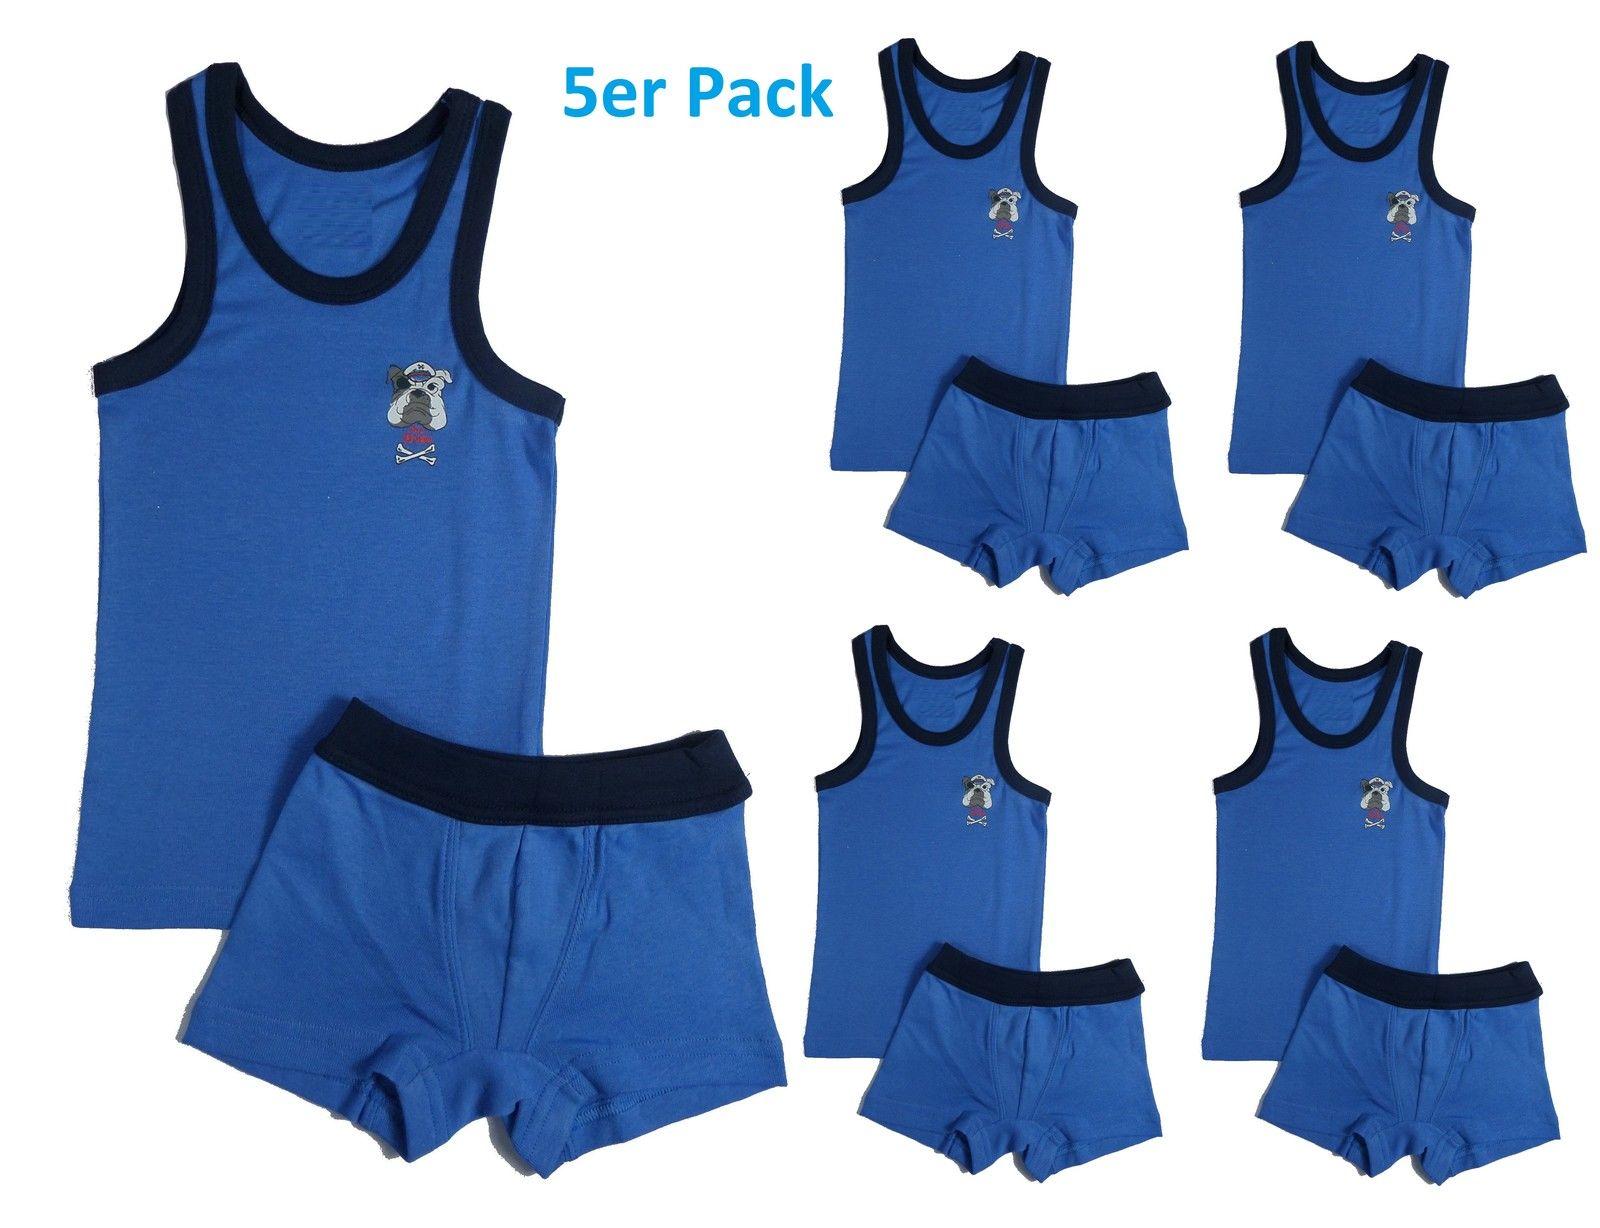 5er Set Jungen Knaben Garnitur 5 Stück  Kinder Unterhemd+ Hose Unterwäsche blau